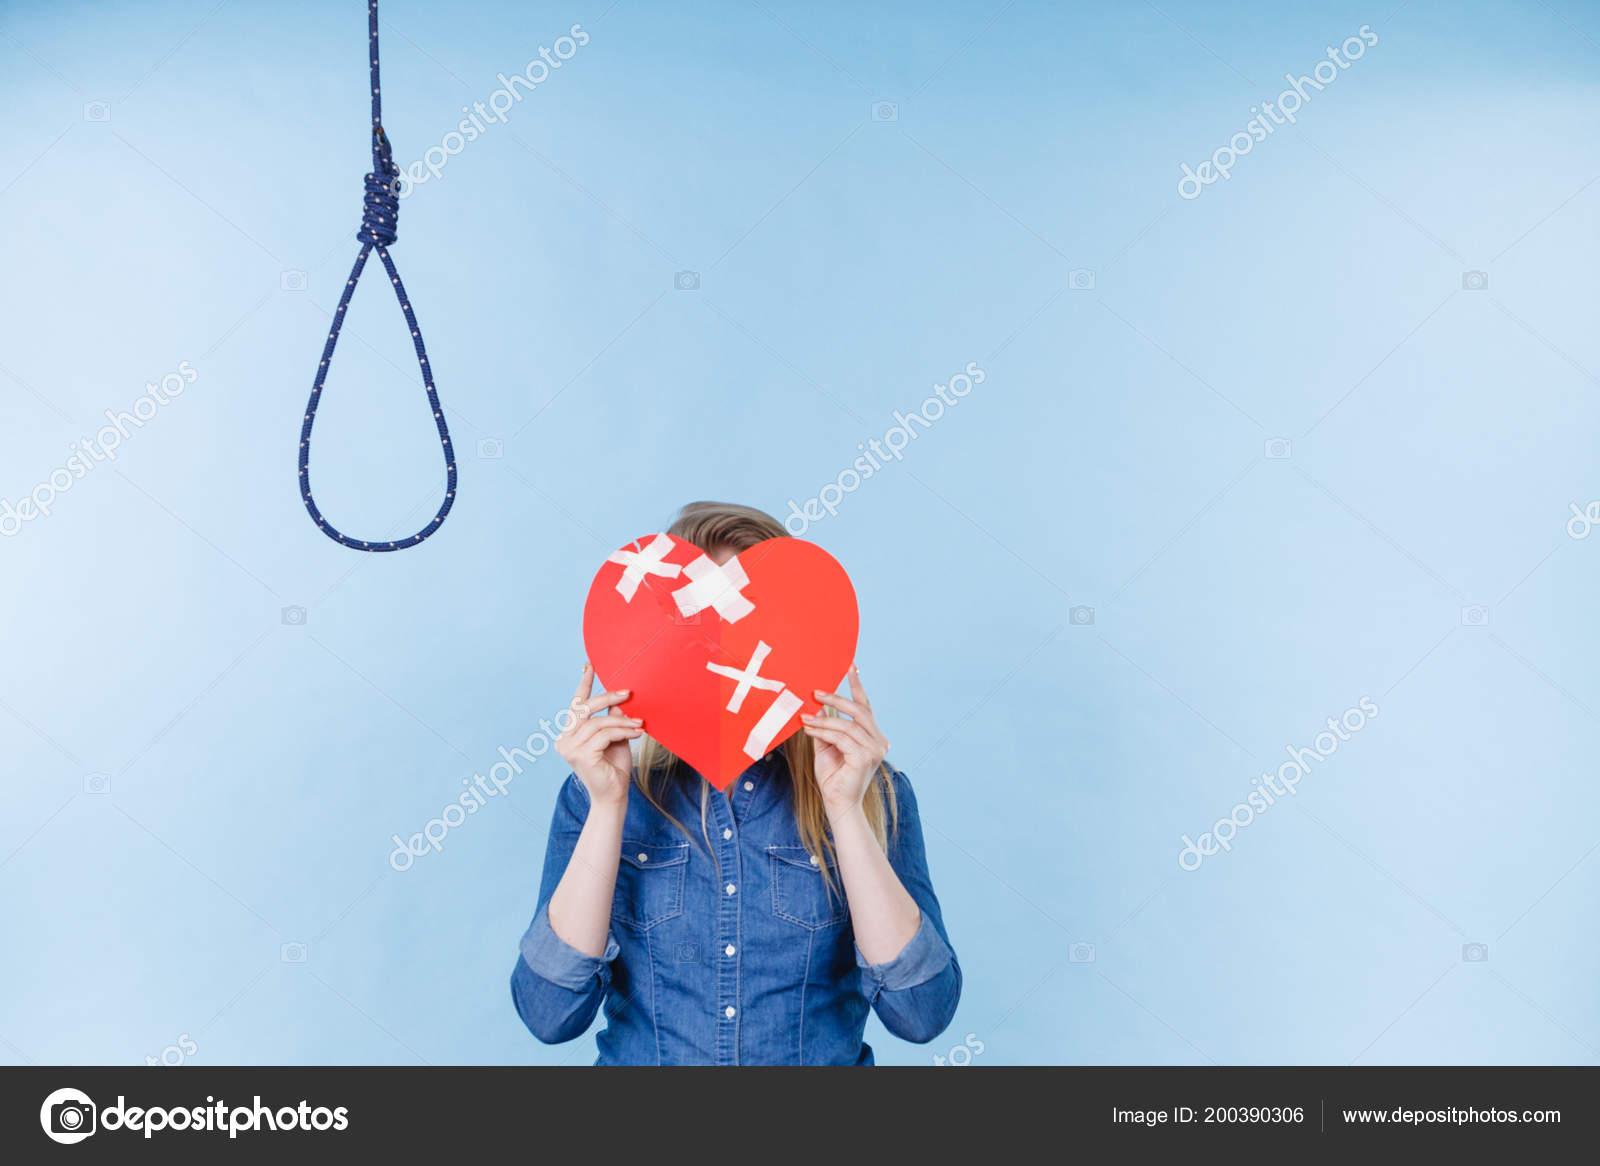 Sad Depressed Woman Thinking Suicide Having Broken Heart Relationship Breakup Stock Photo C Anetlanda 200390306